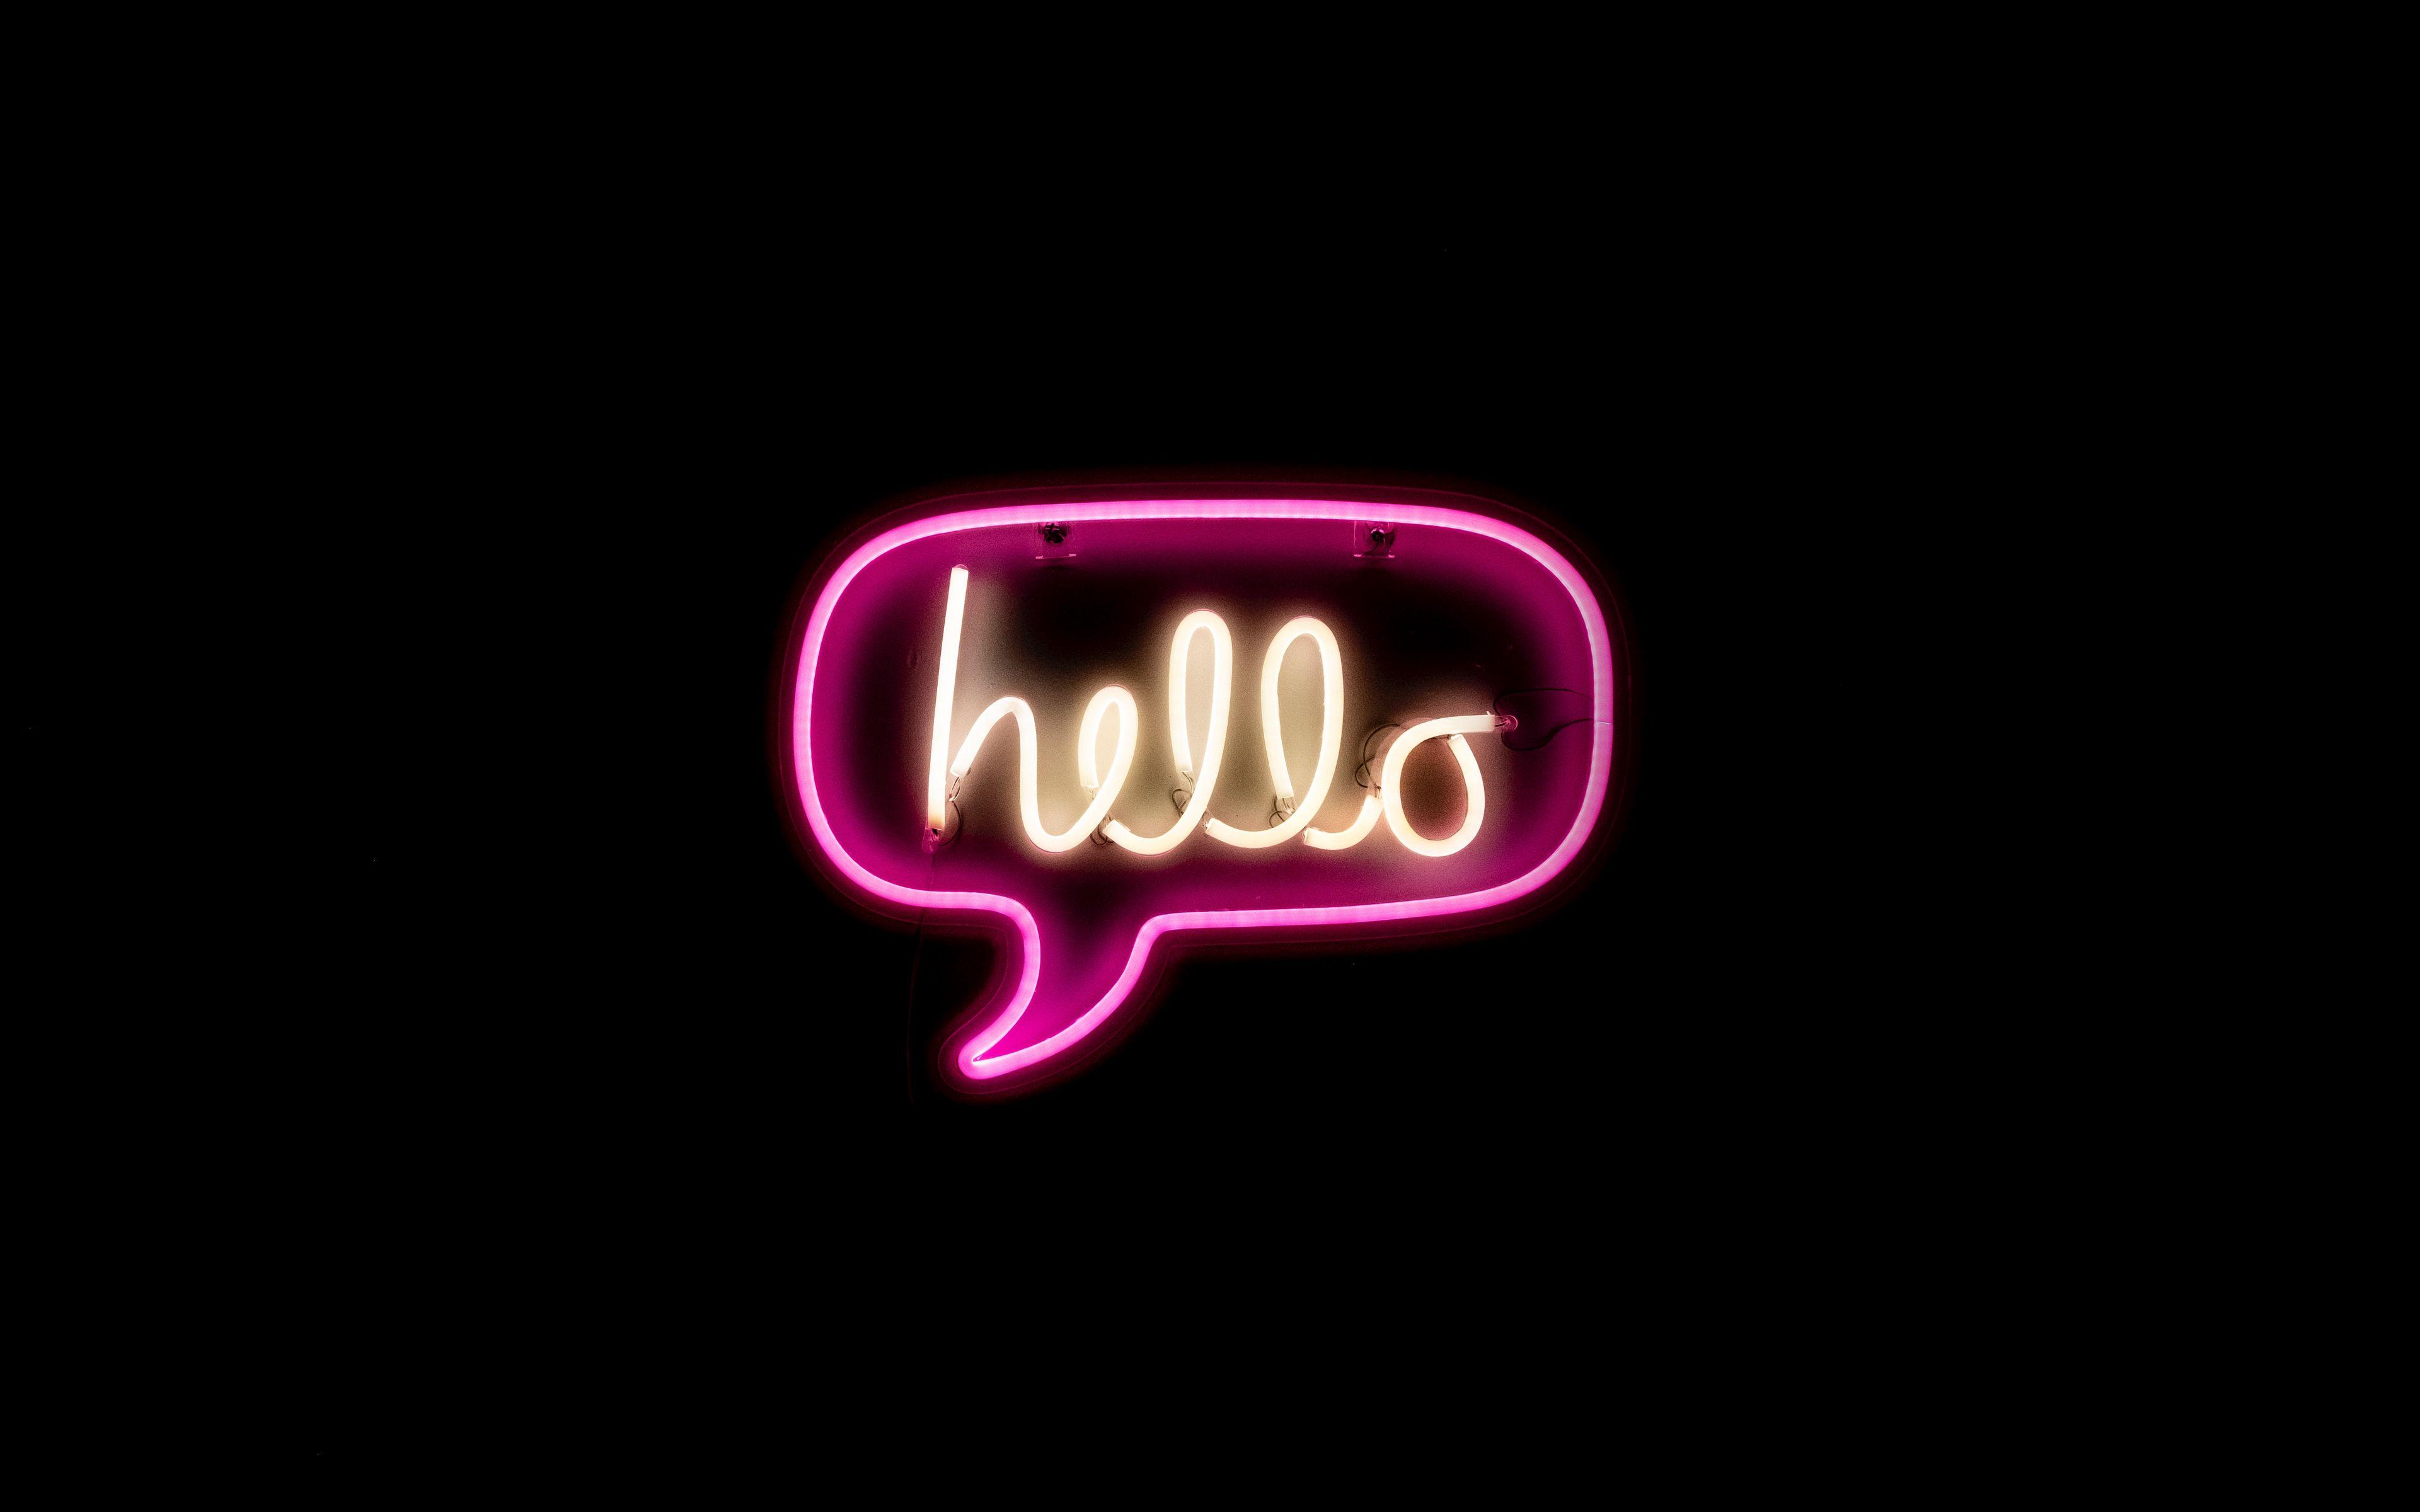 3840x2400 Wallpaper hello, neon, inscription, text